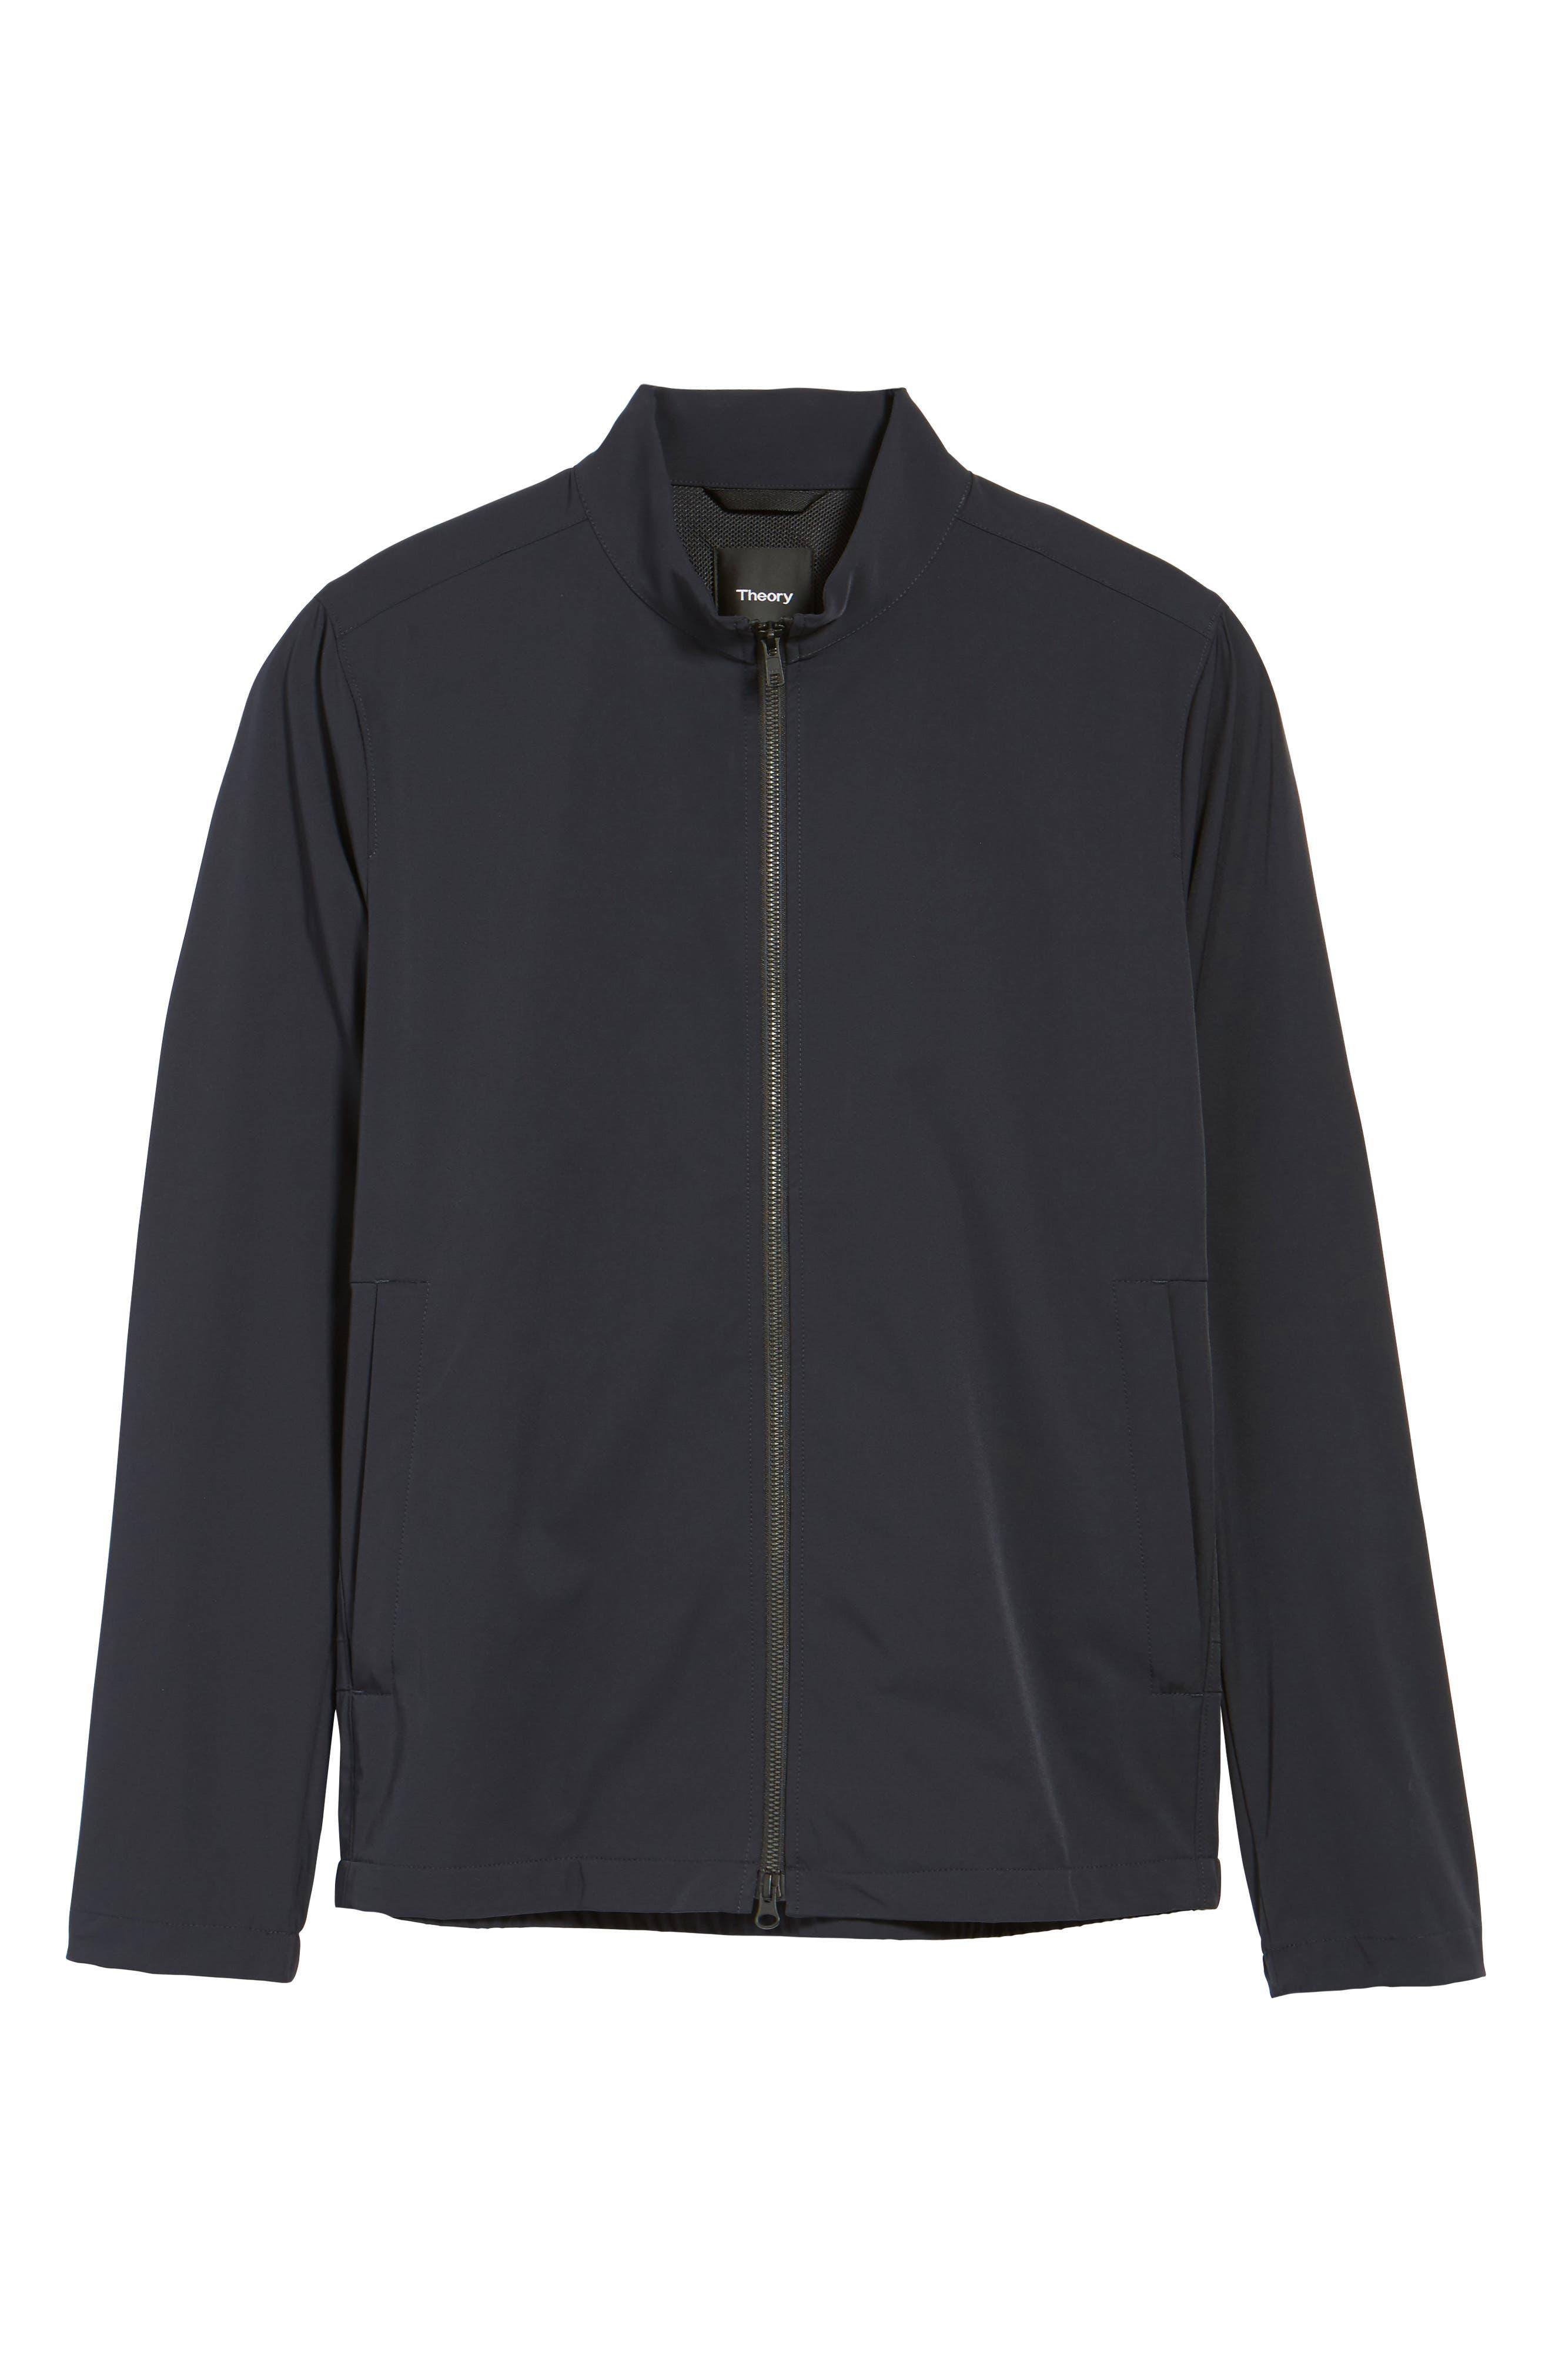 Scotty Bevan Zip Front Jacket,                             Alternate thumbnail 5, color,                             Eclipse